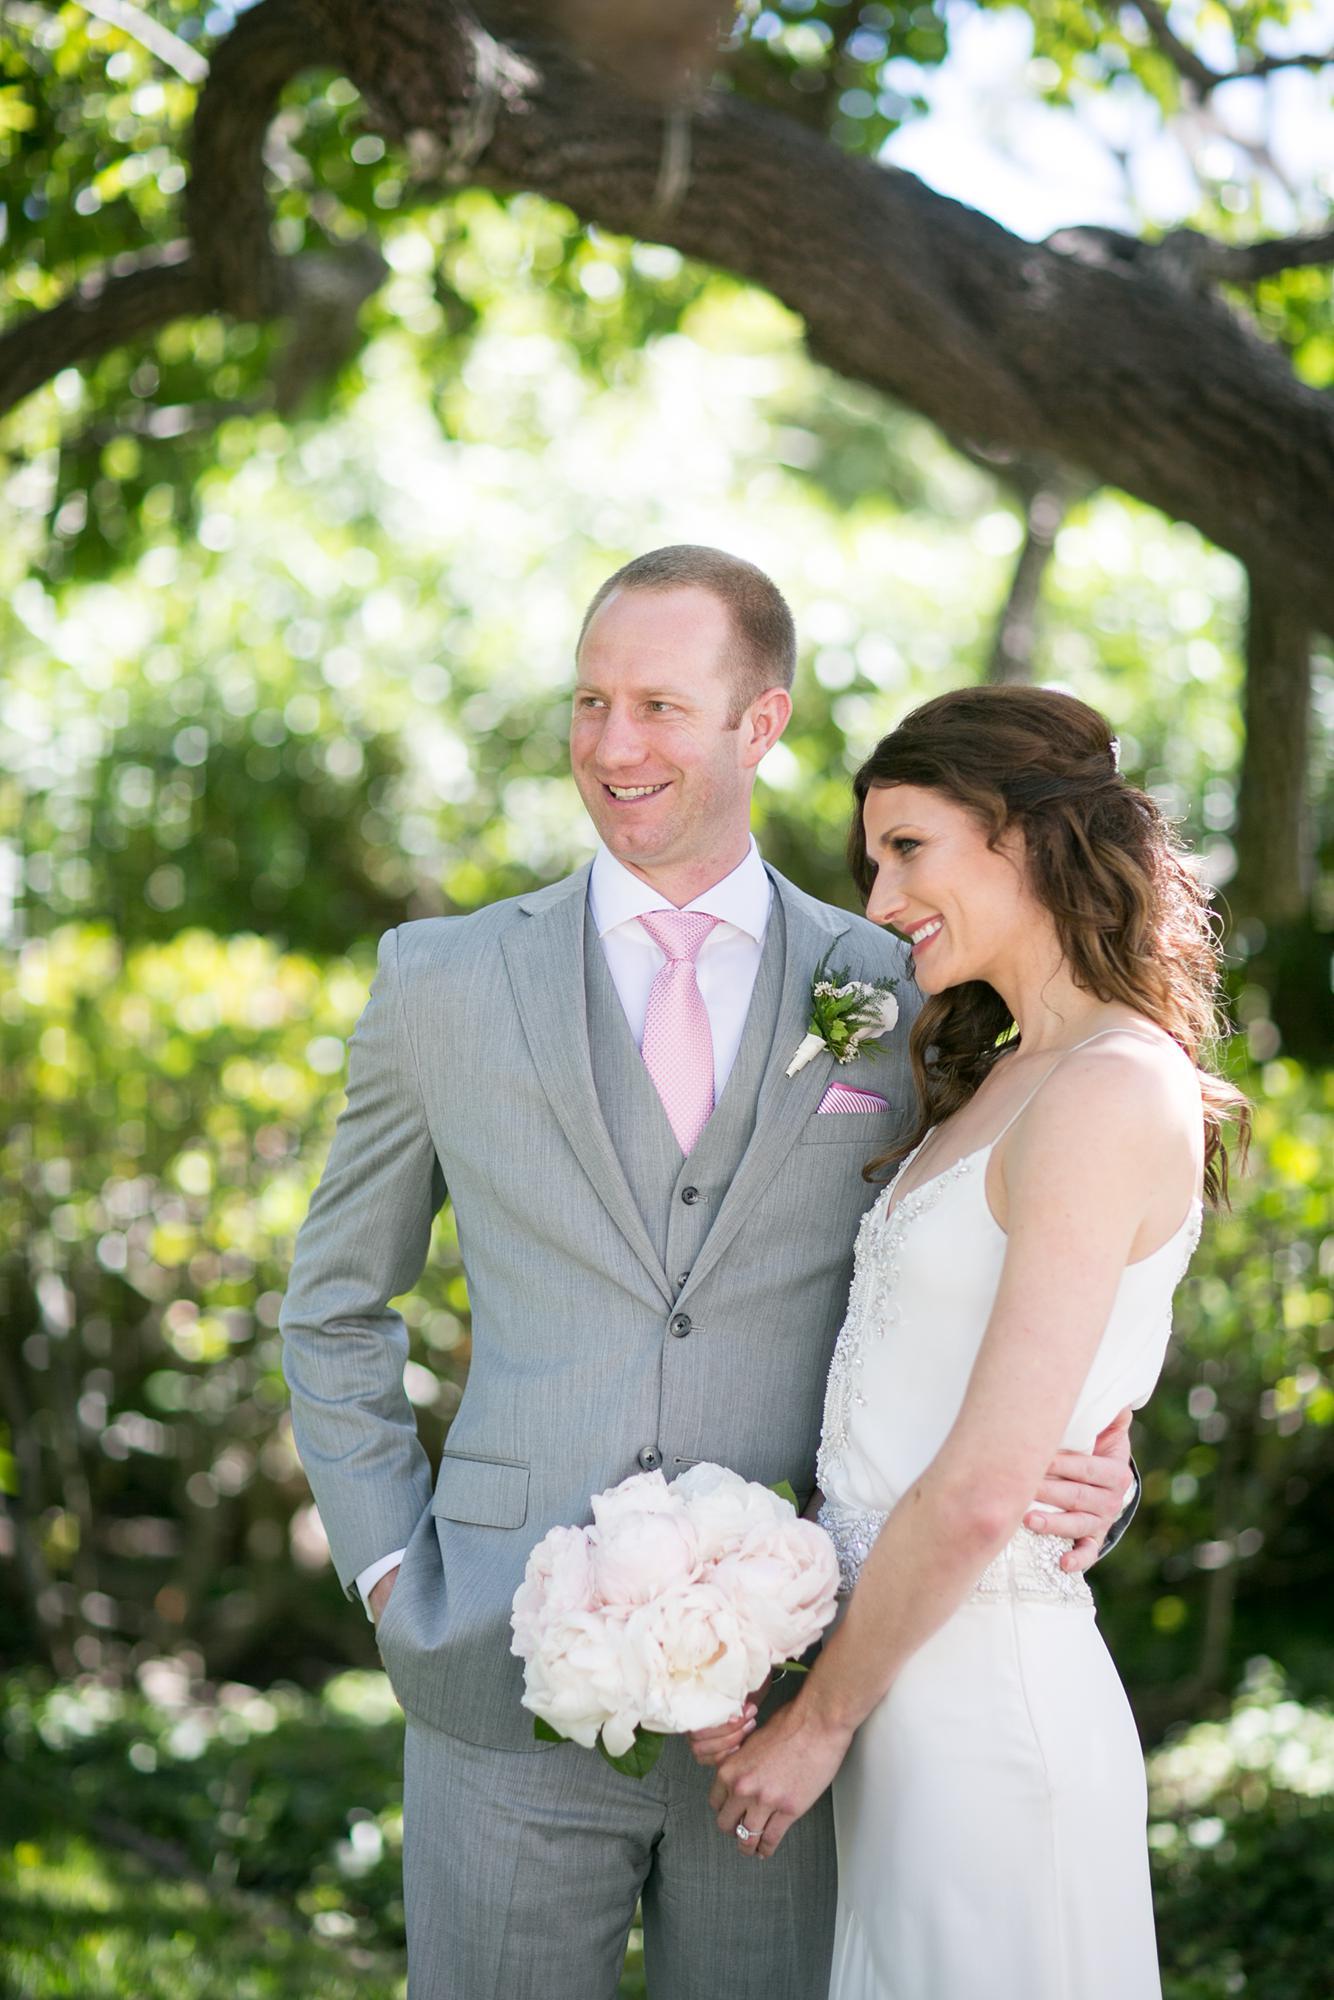 Palos Verdes Private Estate Wedding   Miki & Sonja Photography   mikiandsonja.com